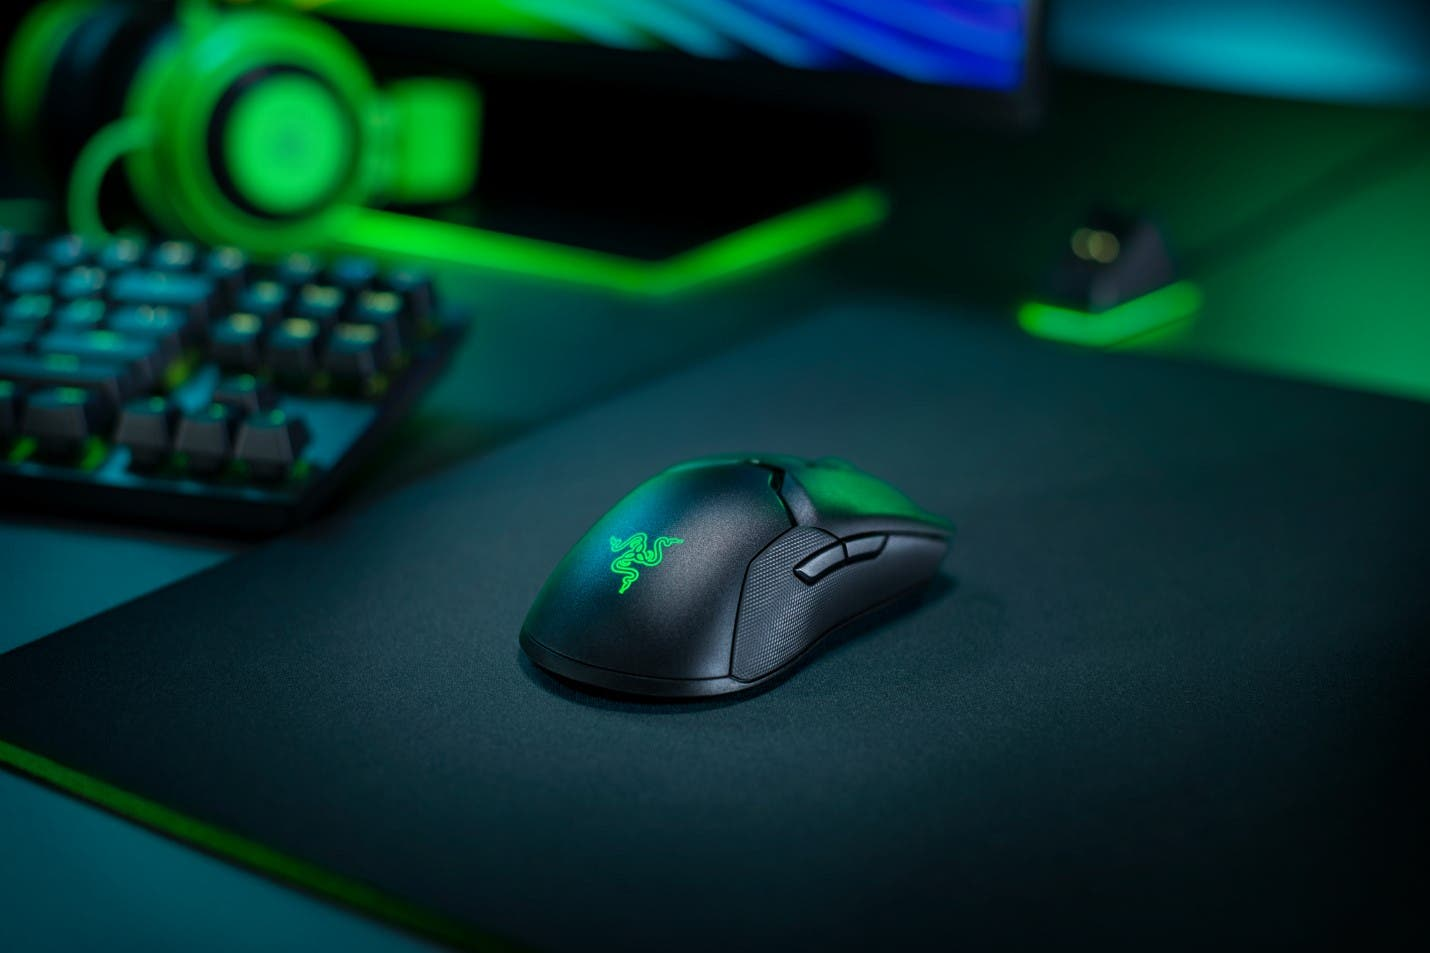 Este es el nuevo Razer Viper Ultimate Wireless, compatible con Xbox One 7